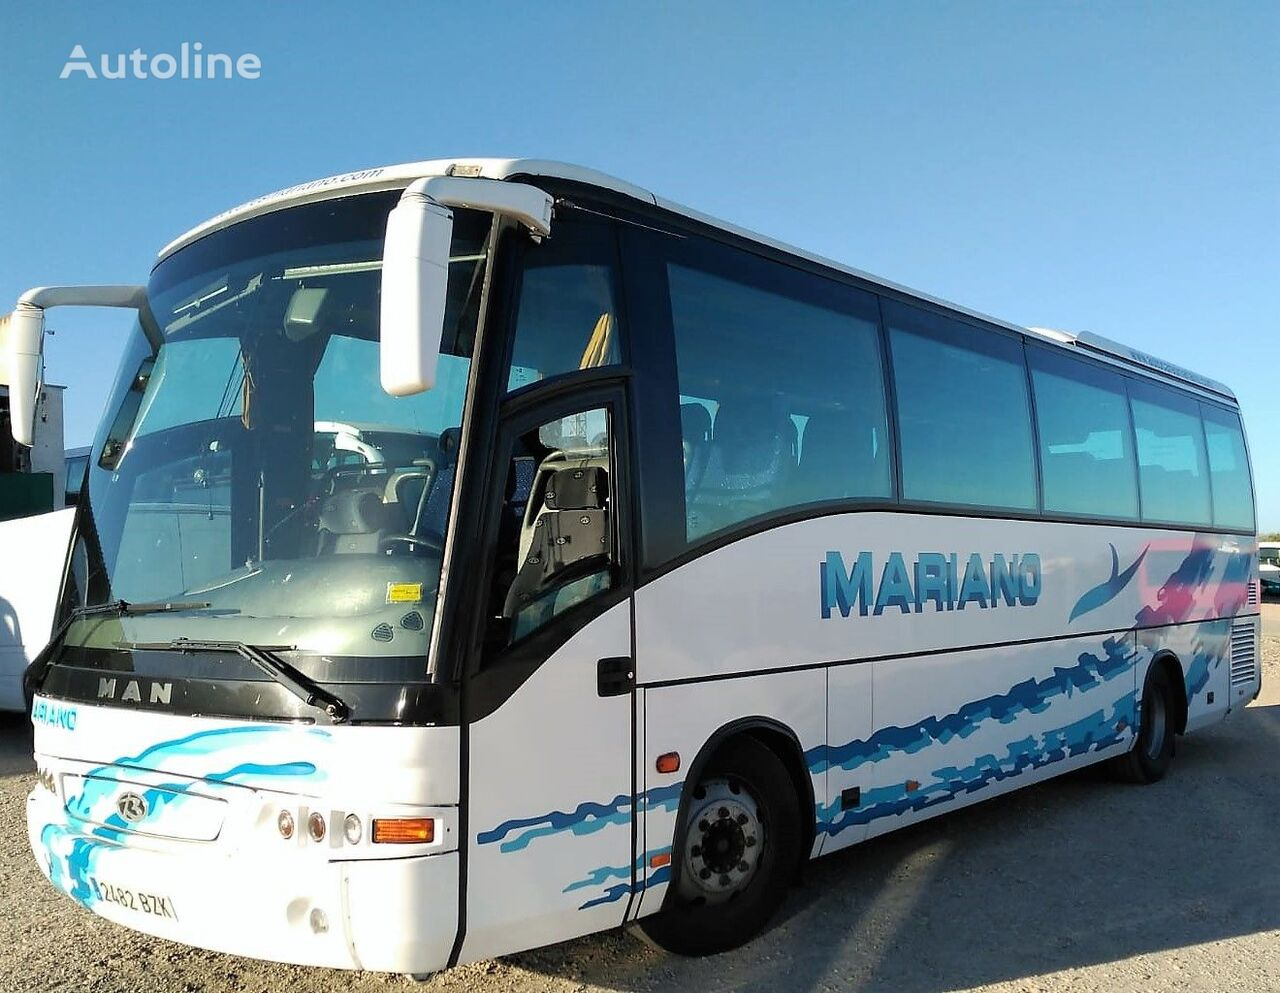 MAN 14.280HOCL BEULAS MIDISTAR+FINAL2002+45PAX+EURO 3 coach bus